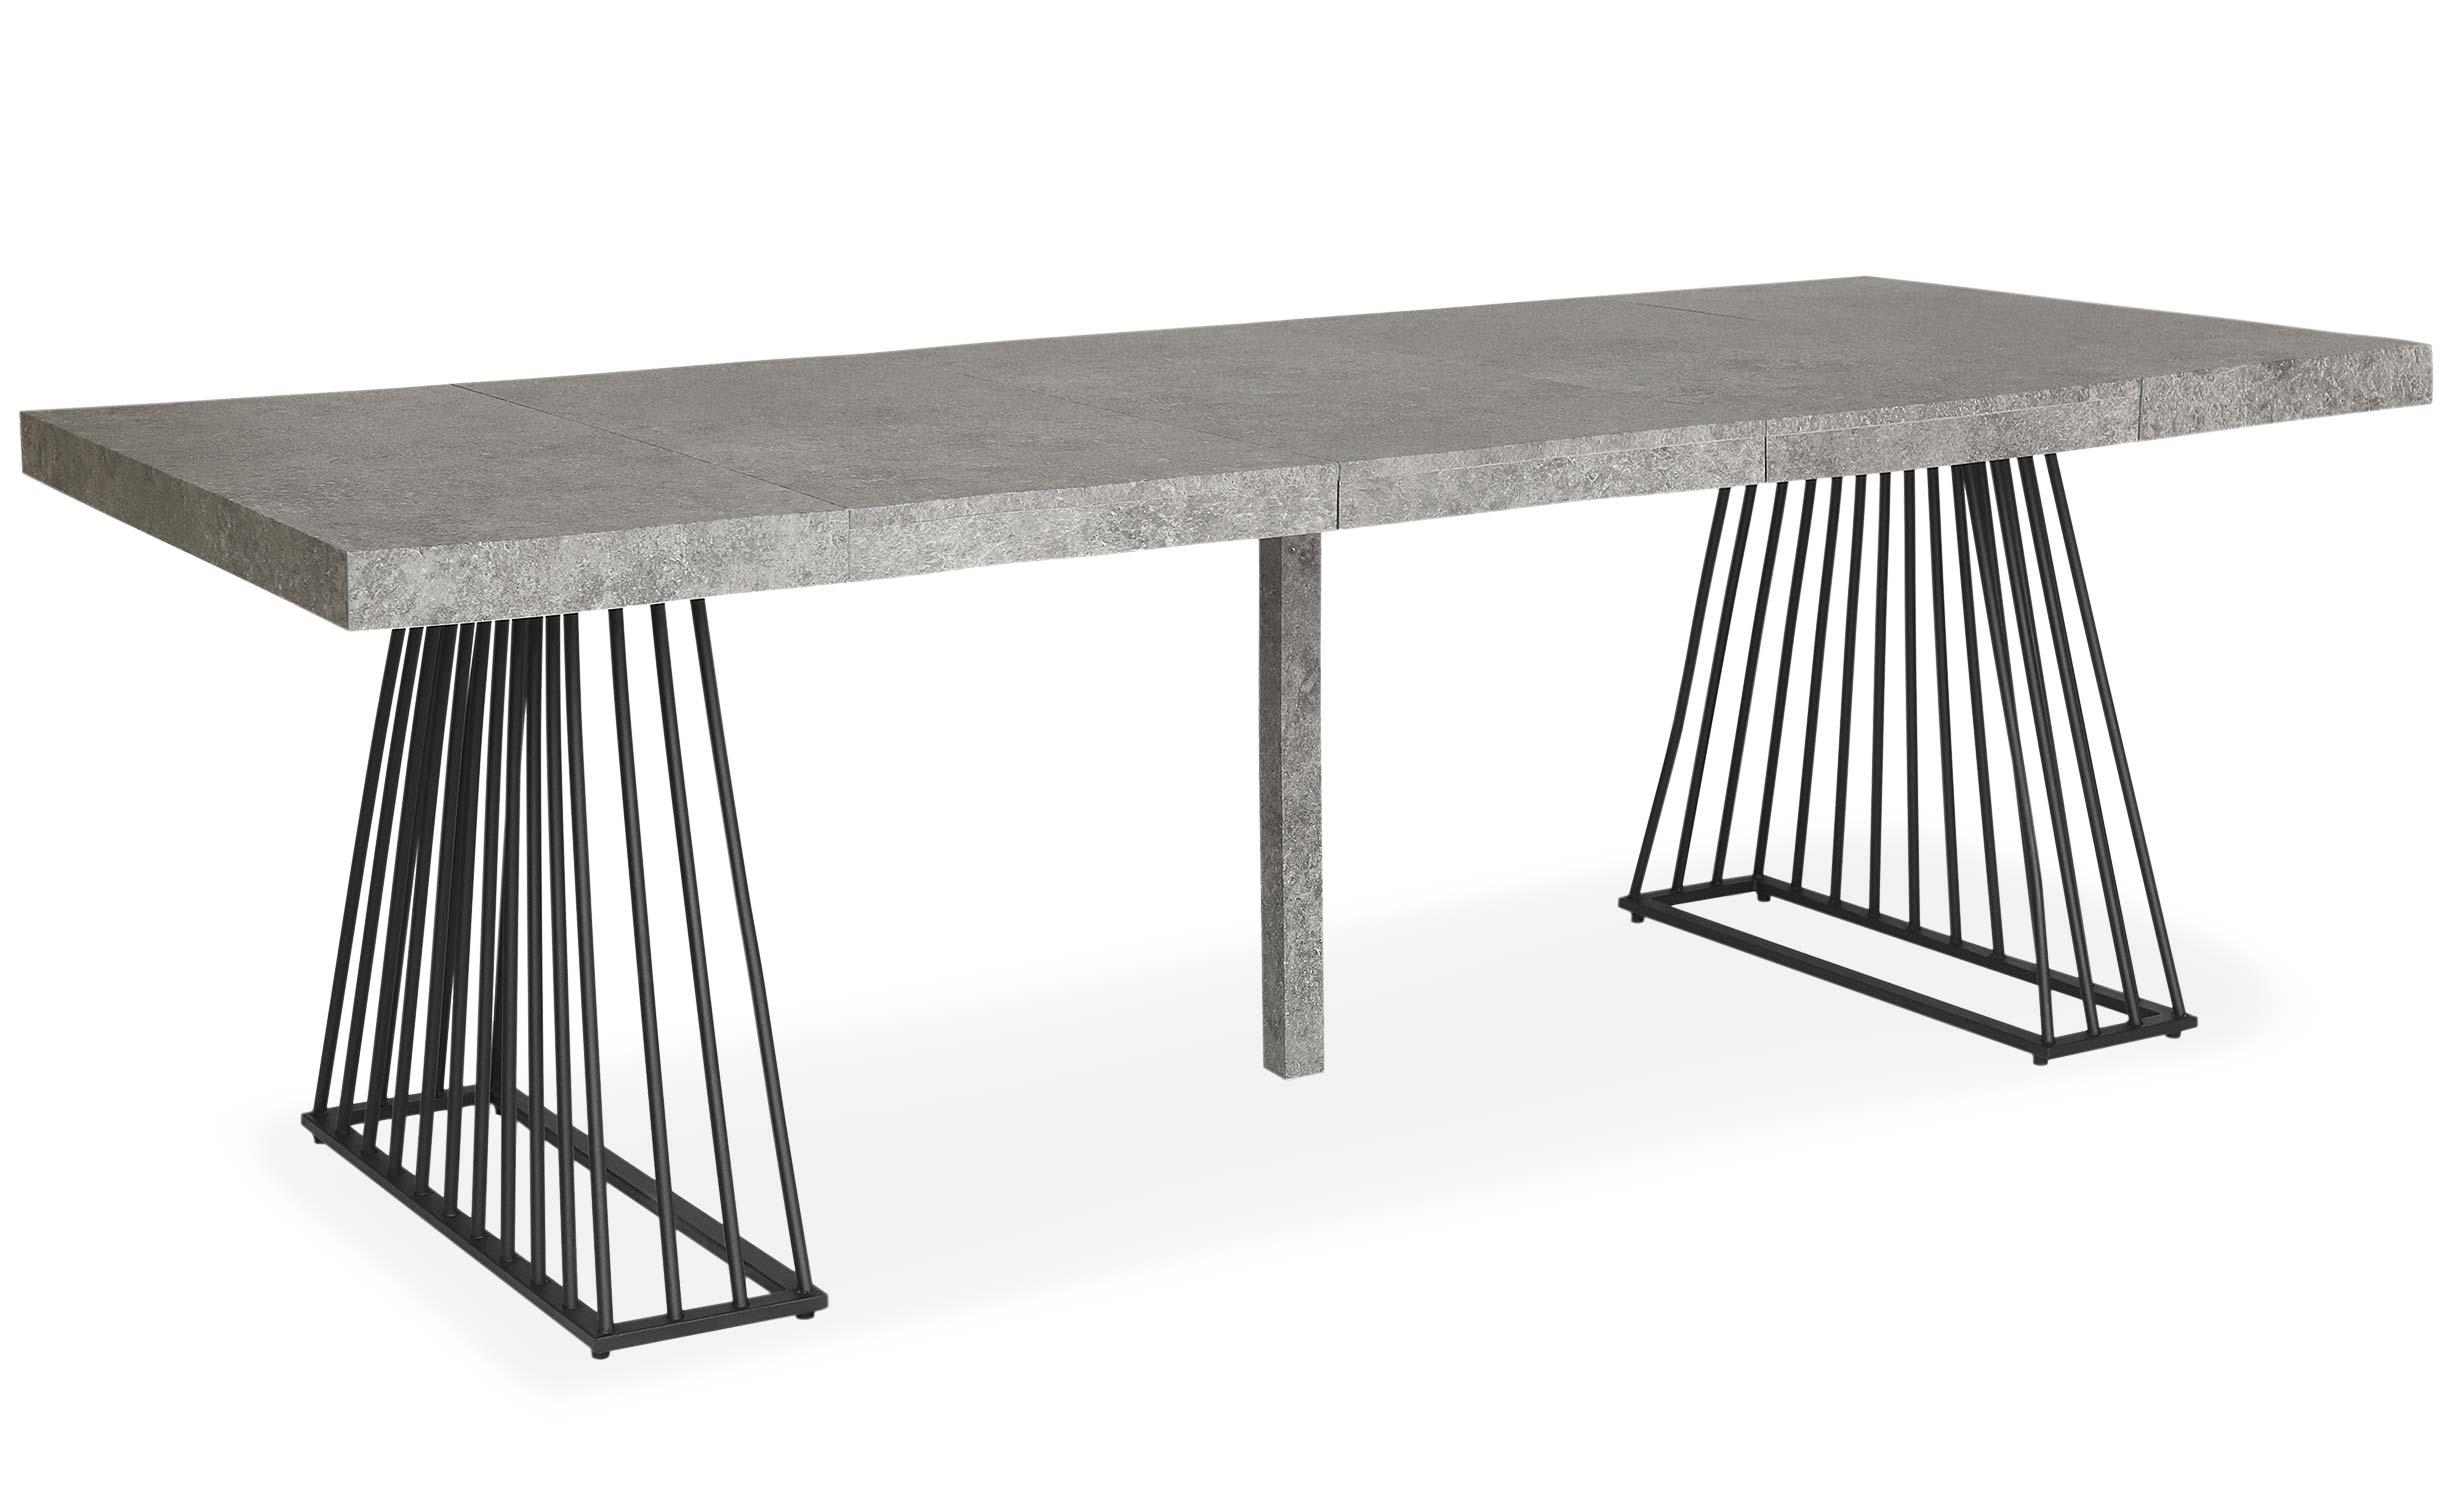 Fabriek uitschuifbare betonnen effecttafel